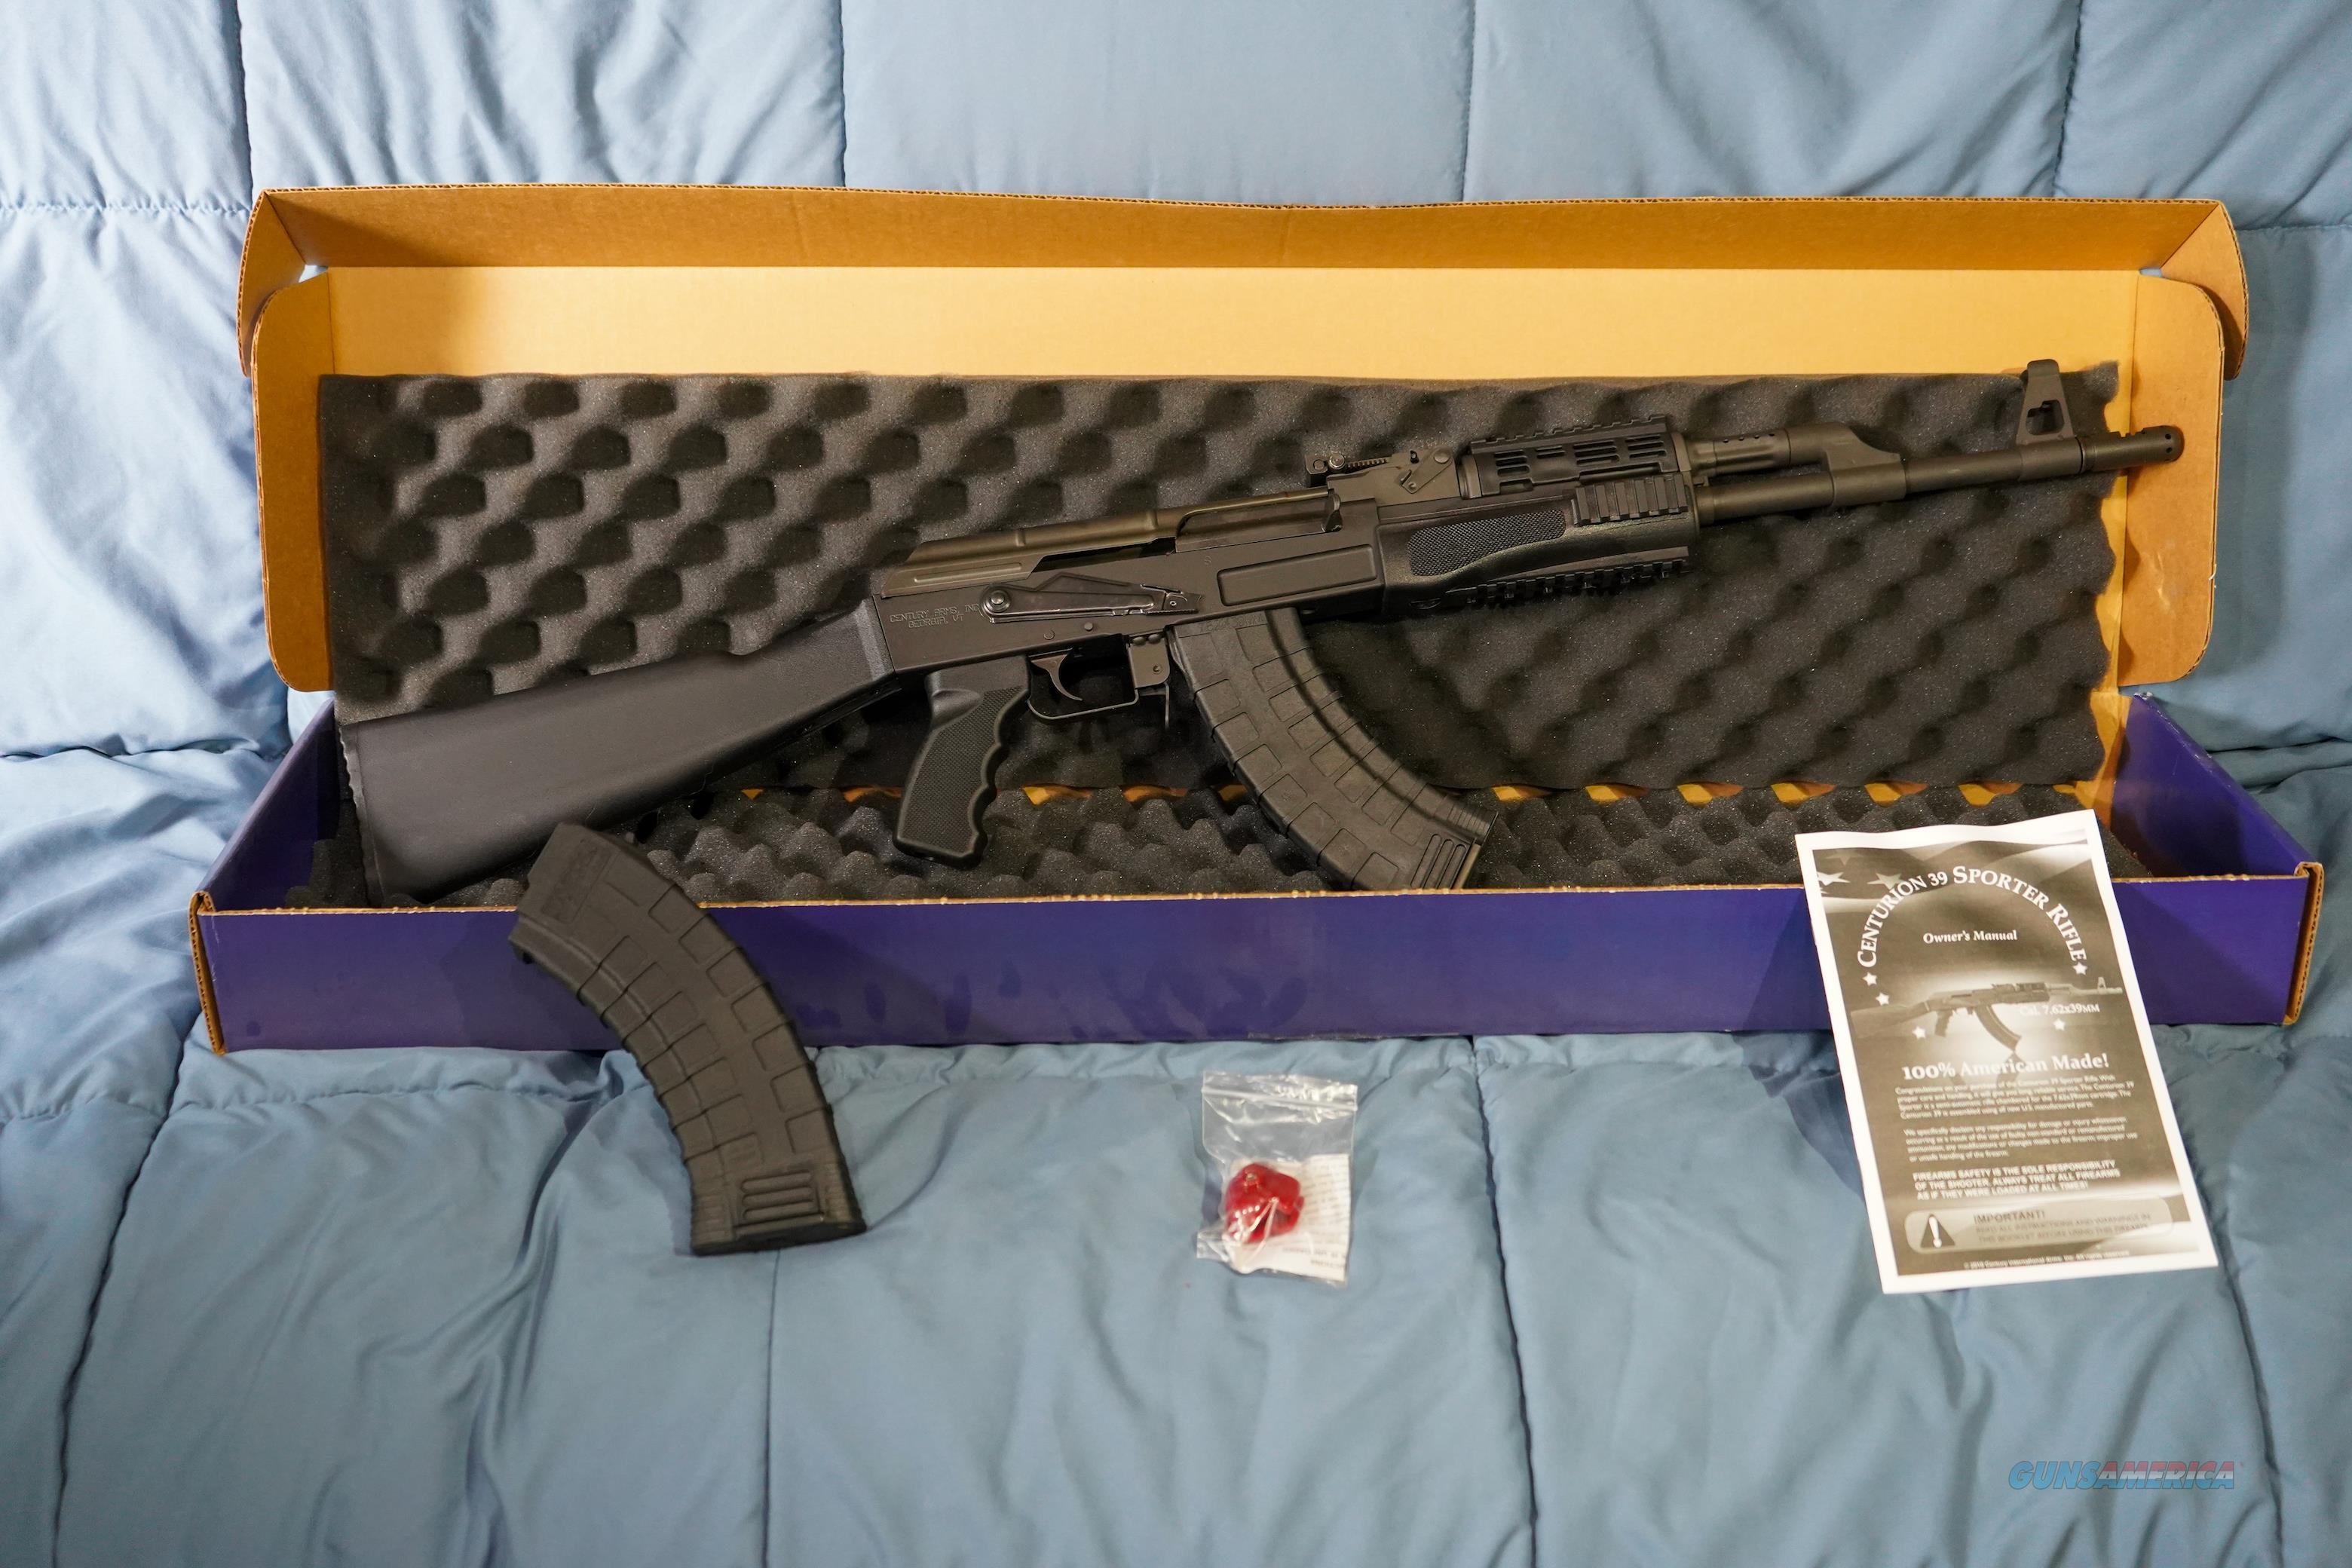 Centurion 39 Sporter  Guns > Rifles > Century International Arms - Rifles > Rifles